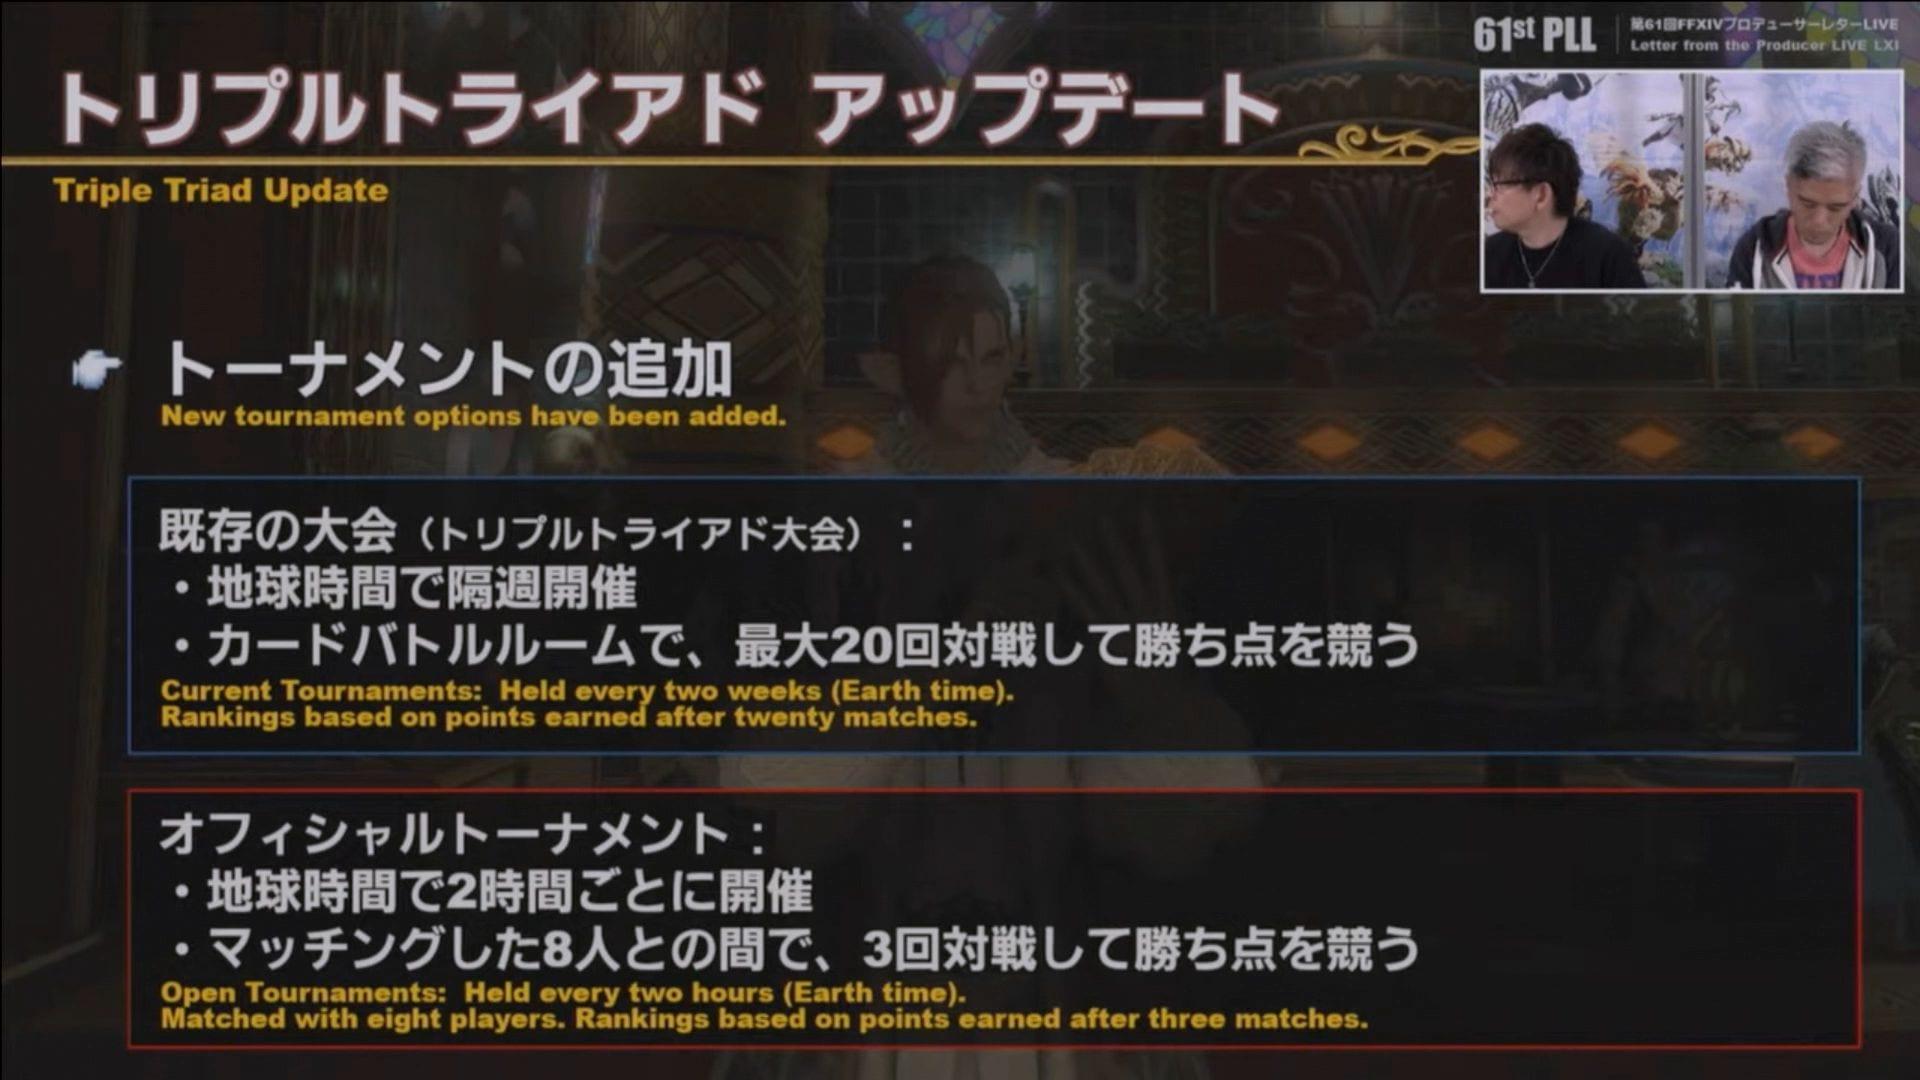 Final-Fantasy-XIV-Screenshot-2020-11-27-14-00-33.jpg?ssl=1